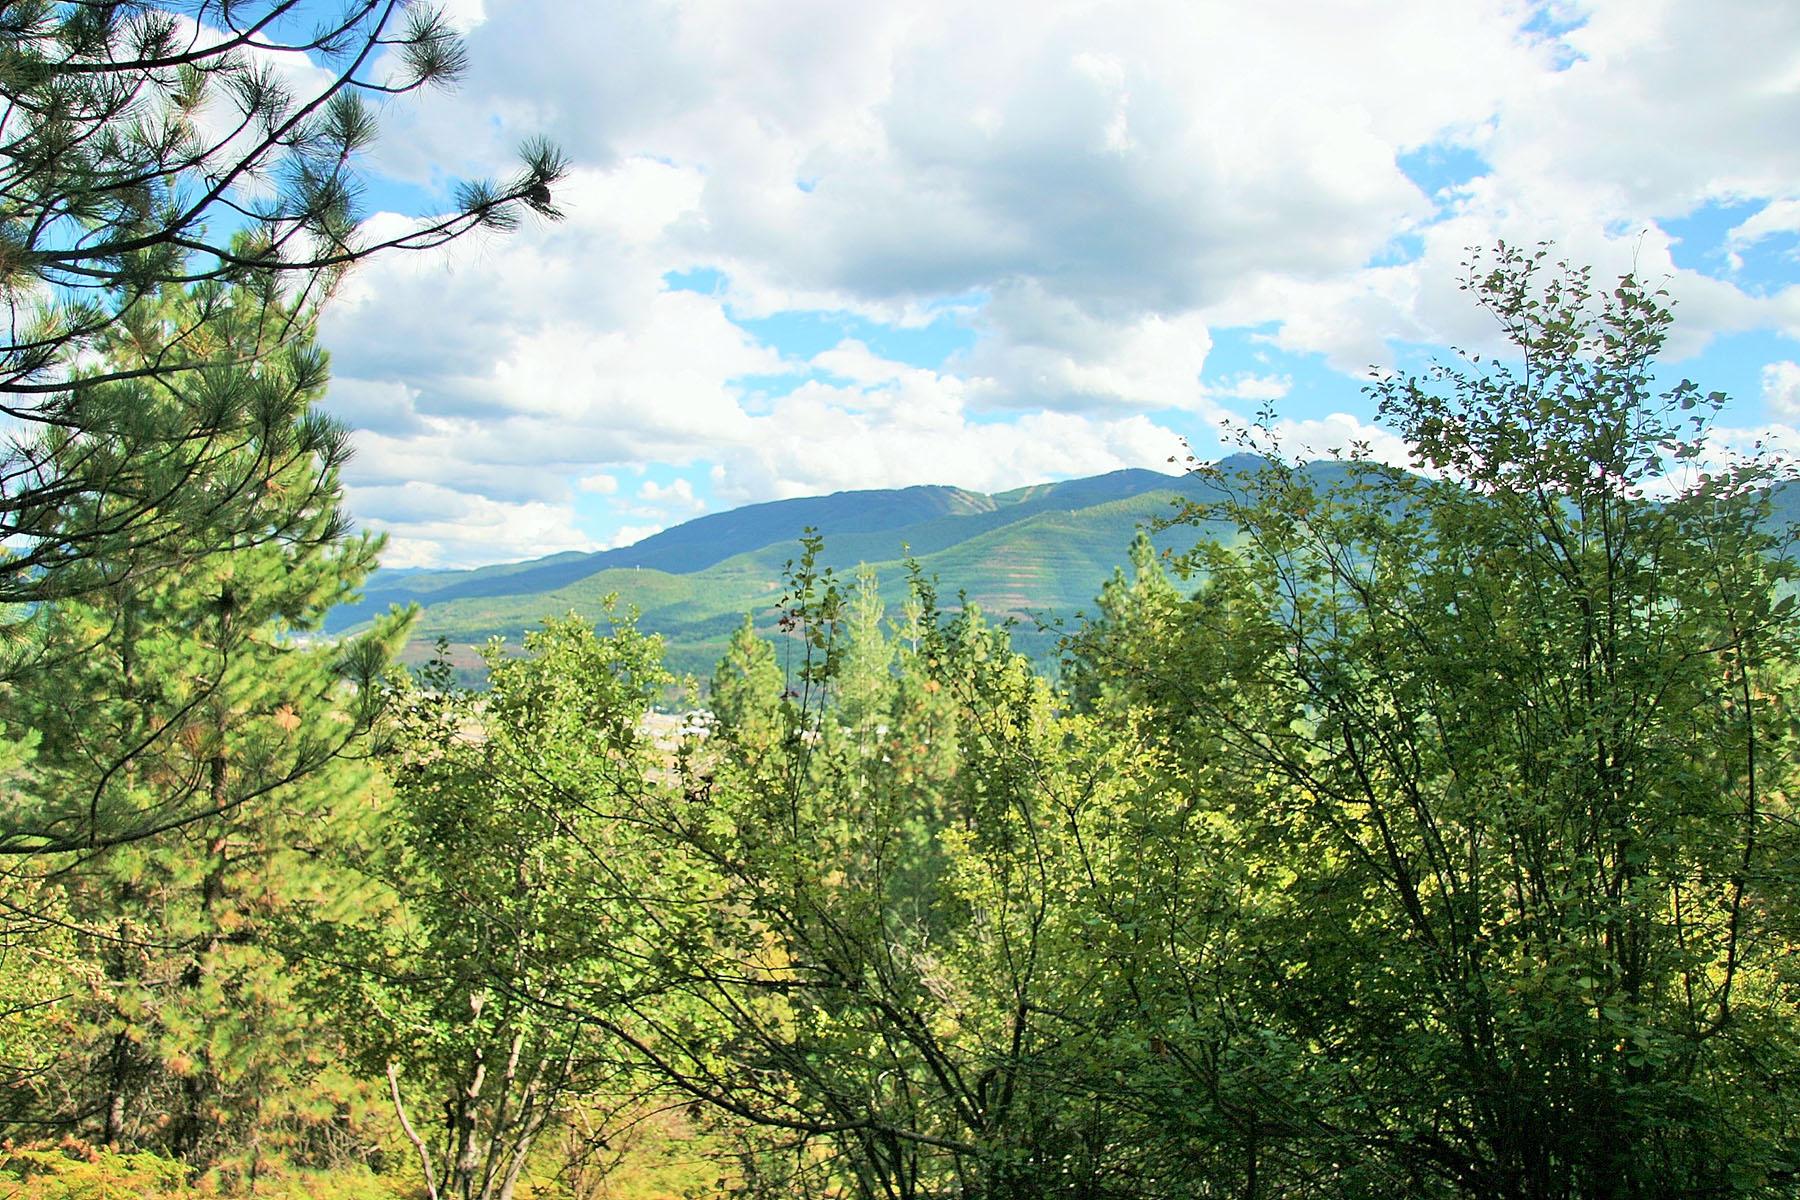 Terrain pour l Vente à 40 acres with a river running through it!! NNA South Fork Ridge 40-1 Smelterville, Idaho, 83868 États-Unis